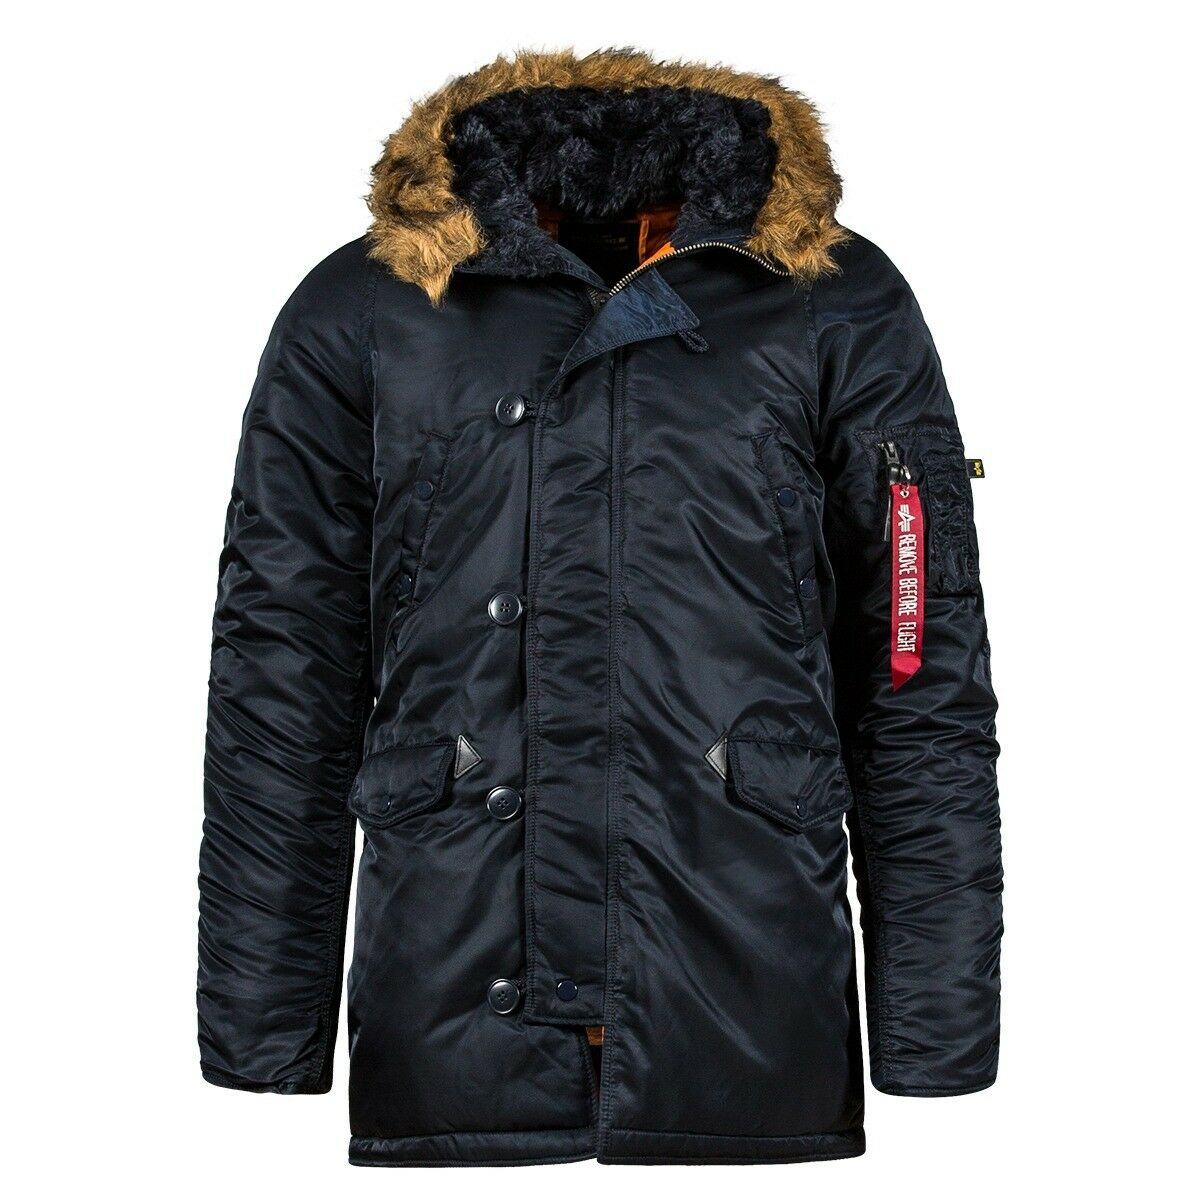 Alpha Industries Slim Fit N-3B Parka Cold Weather Coat Nylon N3B  MJN31210C1